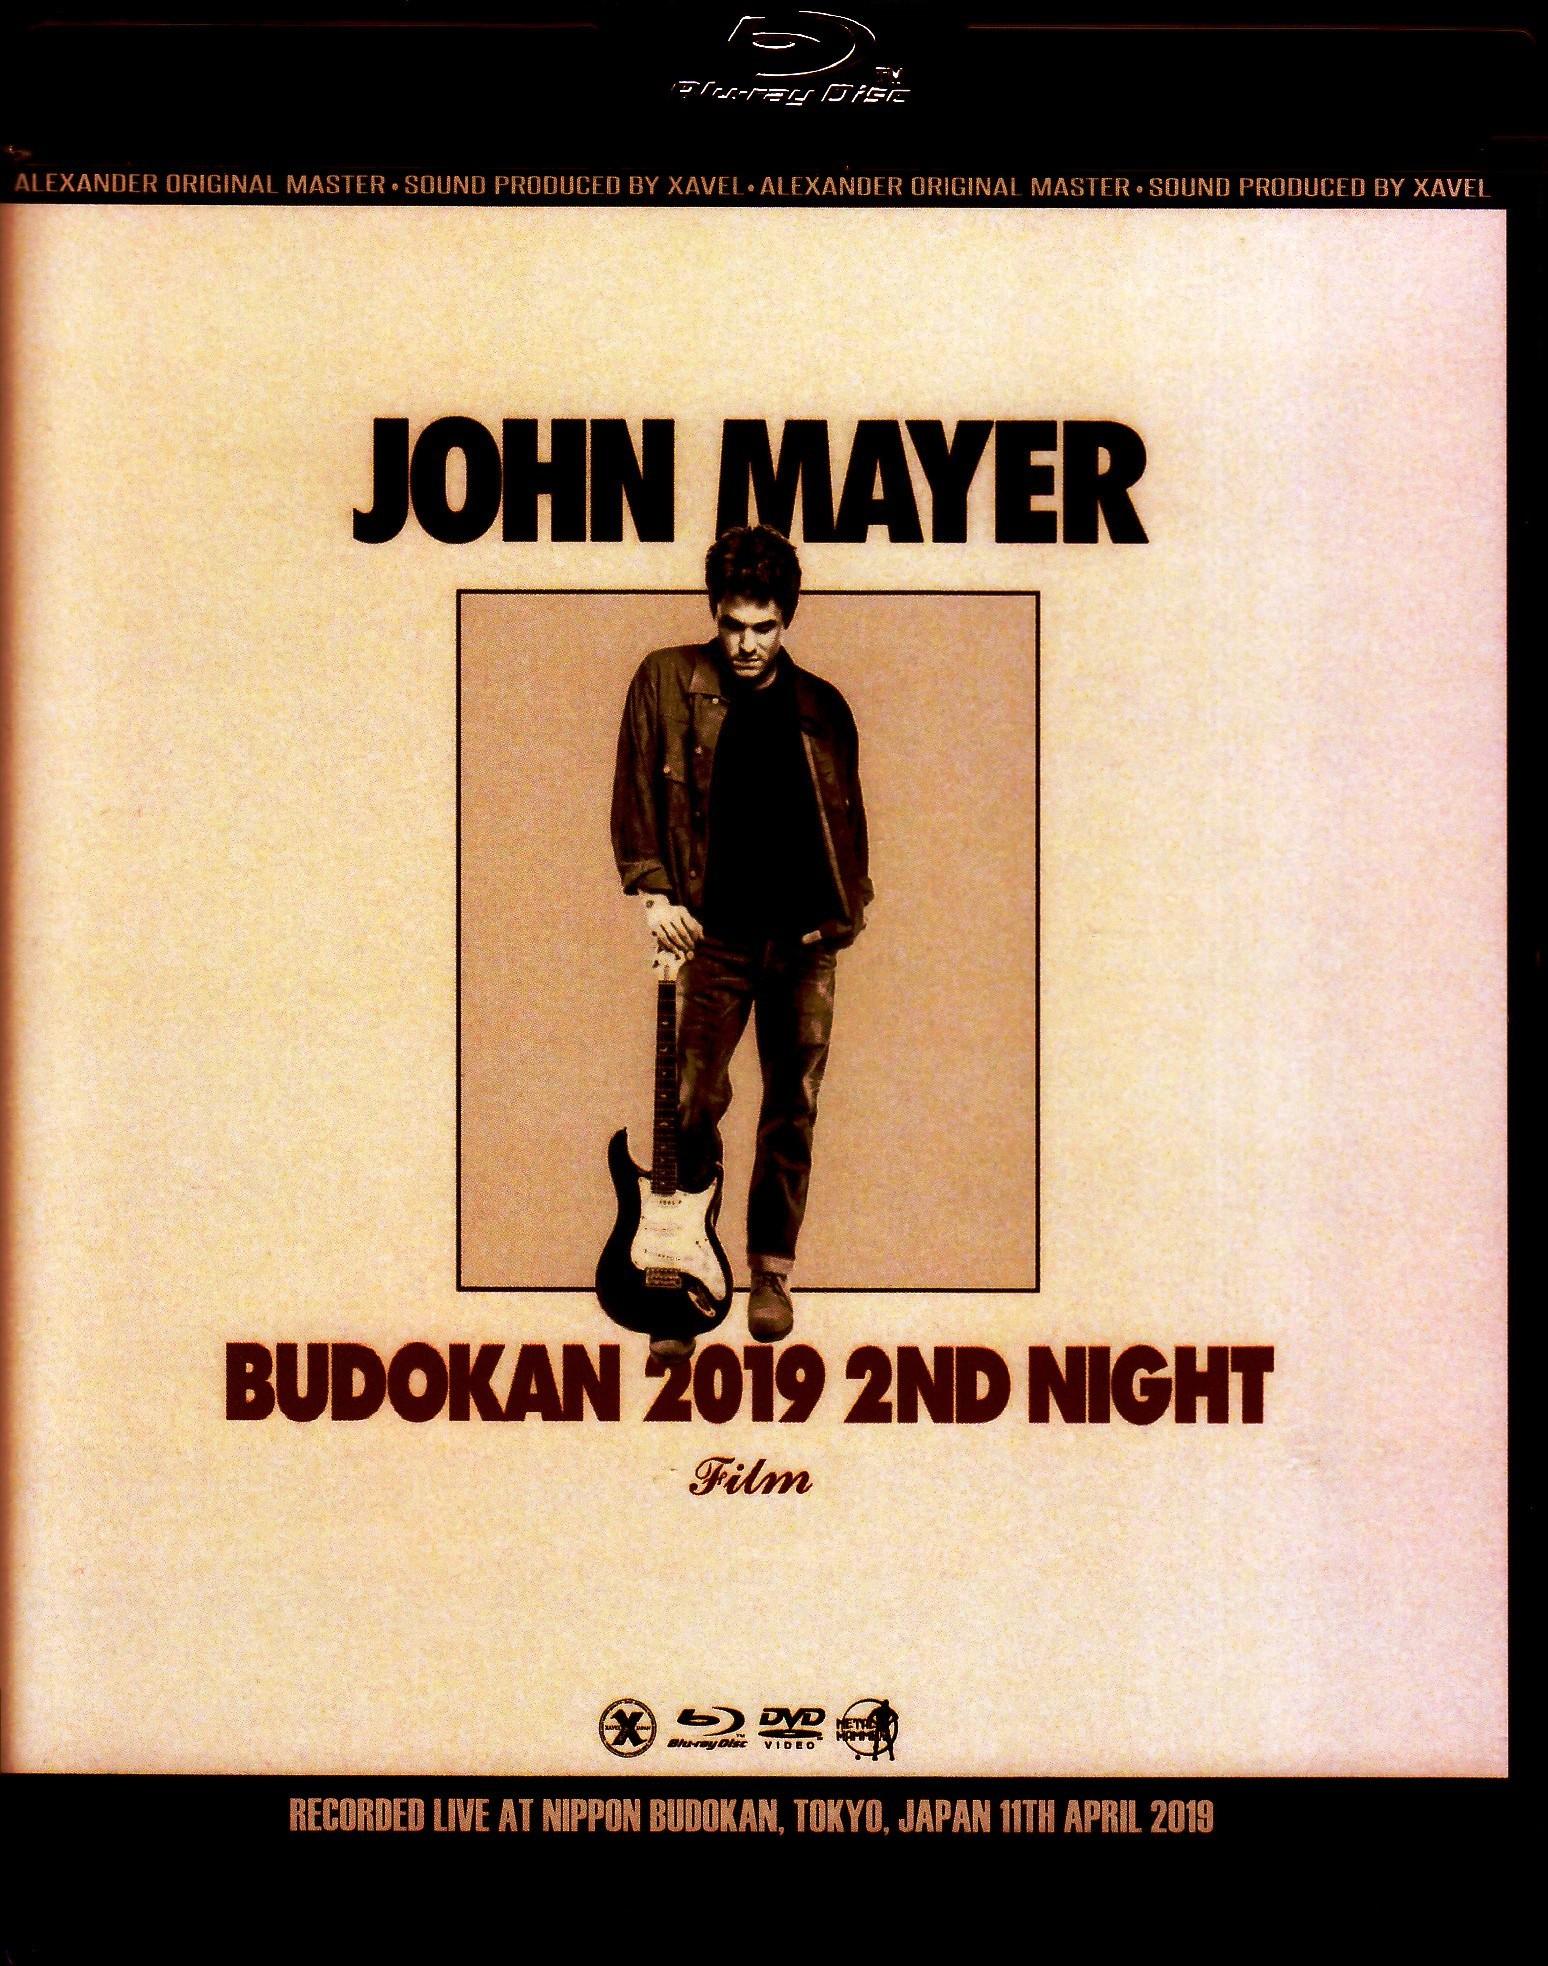 John Mayer ジョン・メイヤー/Tokyo,Japan 4.11.2019 Blu-Ray & DVD Ver